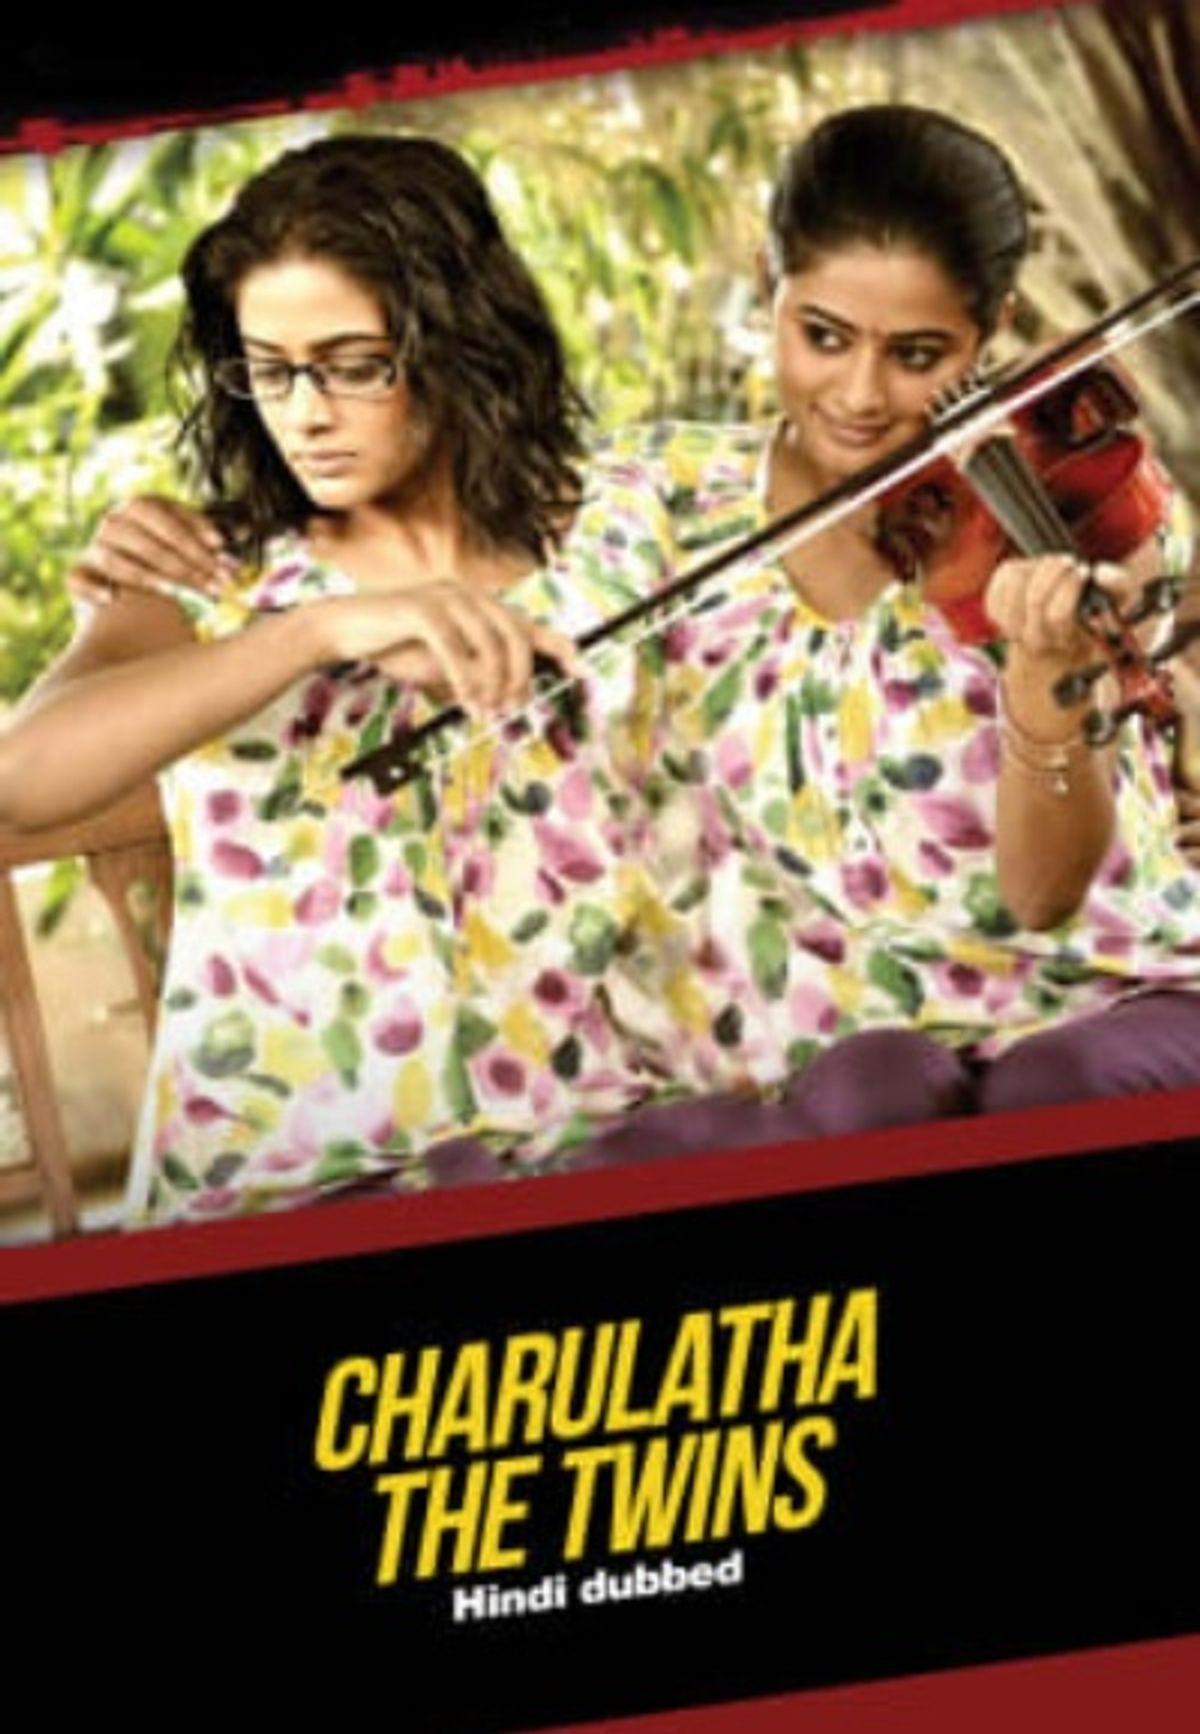 Charulatha The Twins